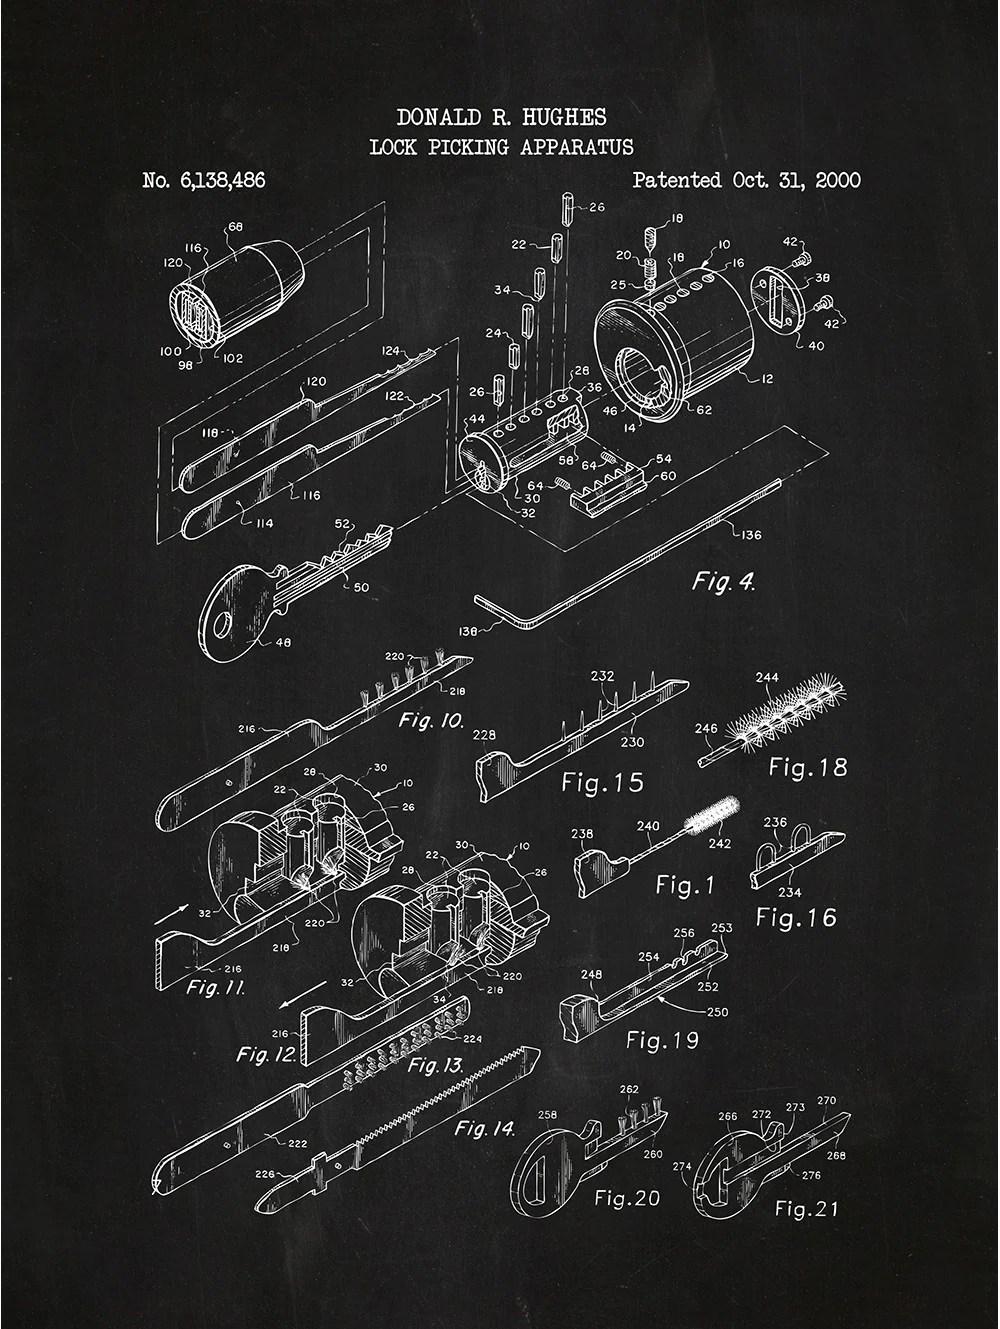 lock picking apparatus donald r hughes 2000 [ 1000 x 1329 Pixel ]